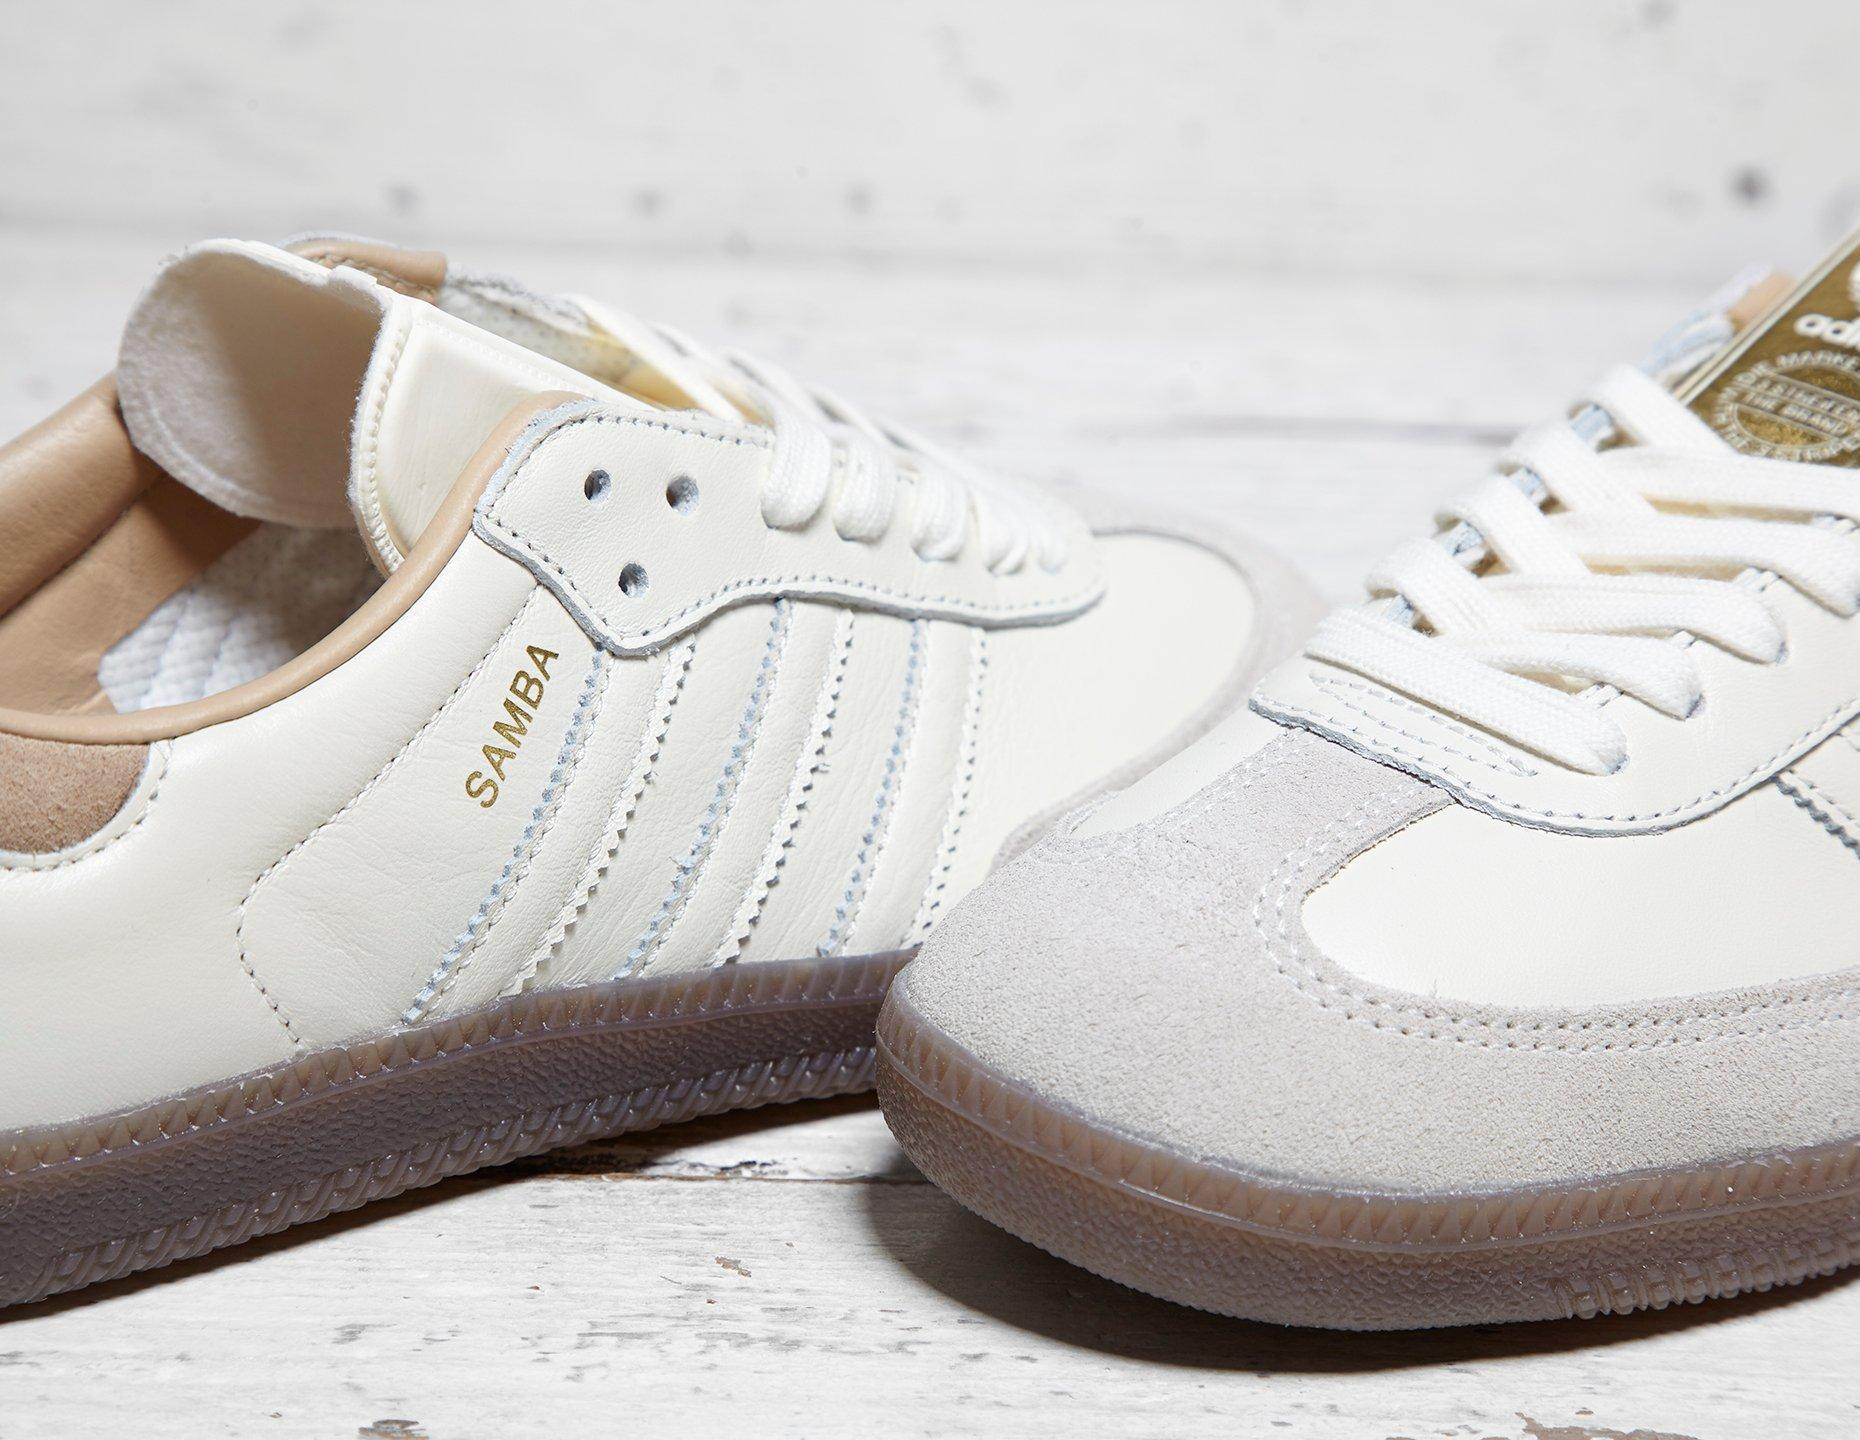 Adidas Shoes James Charles Has